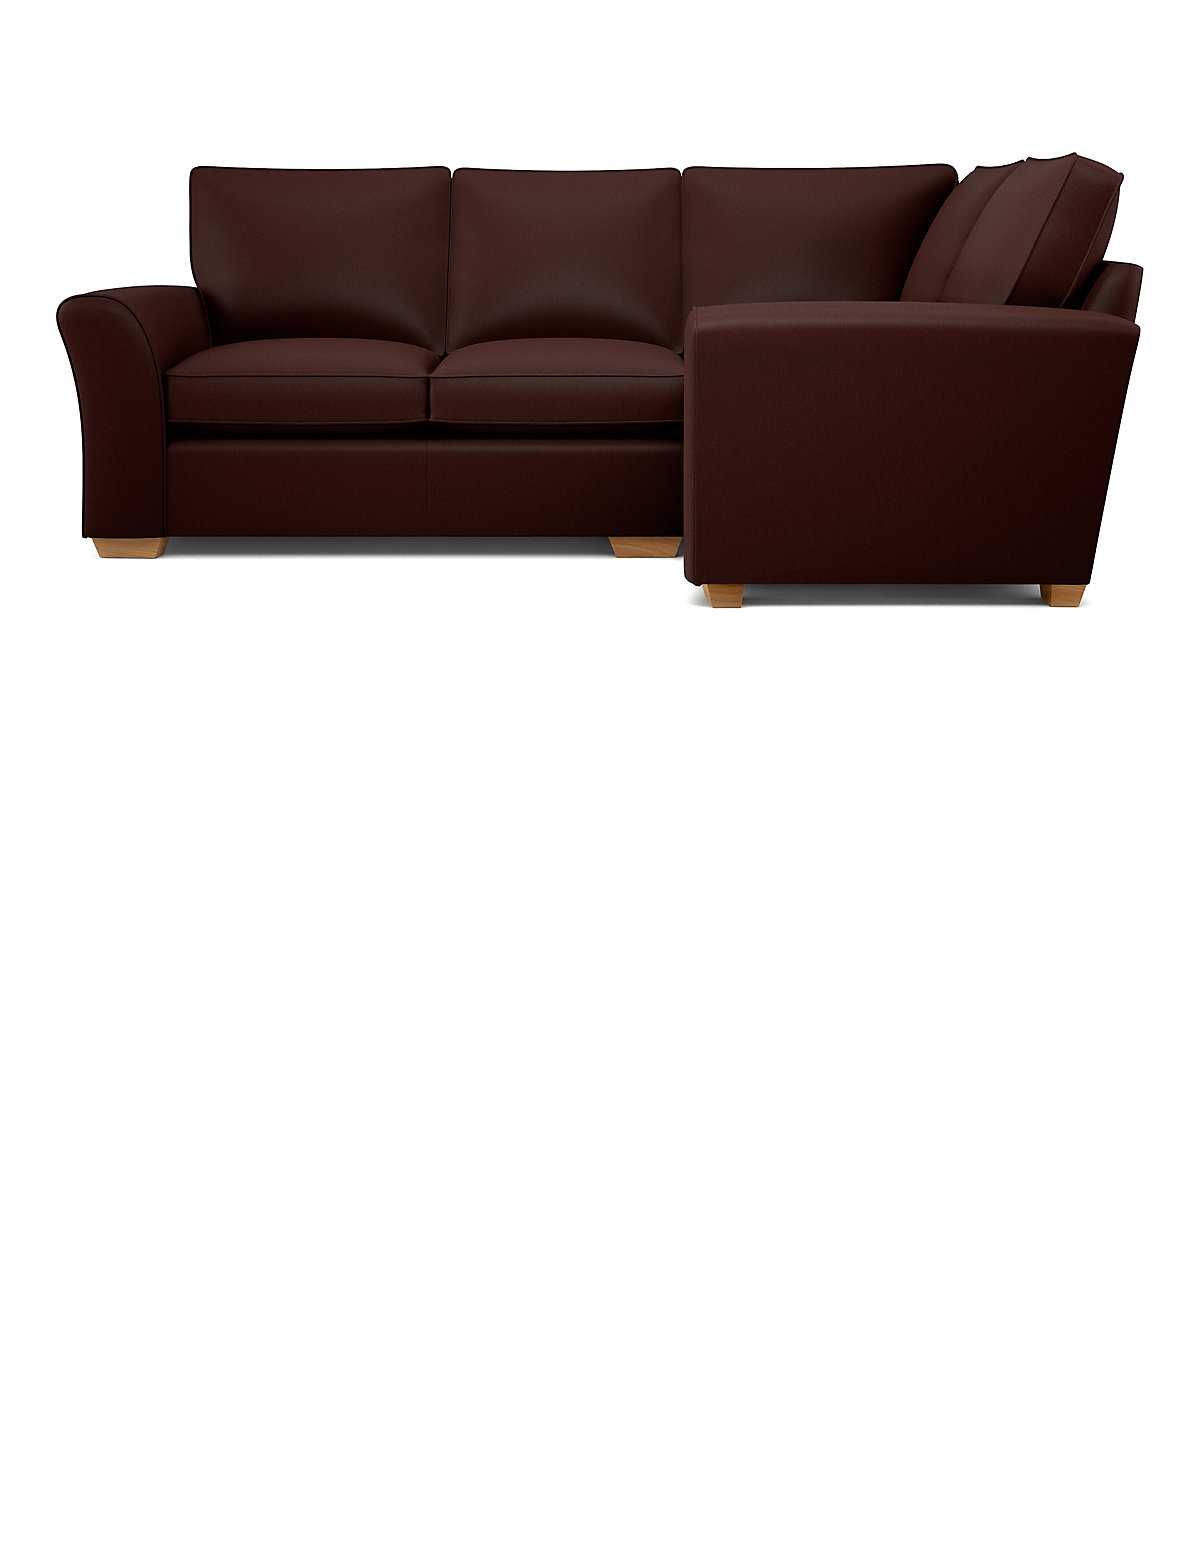 Fabulous Marks And Spencer Furniture Sofas Corner Creativecarmelina Interior Chair Design Creativecarmelinacom